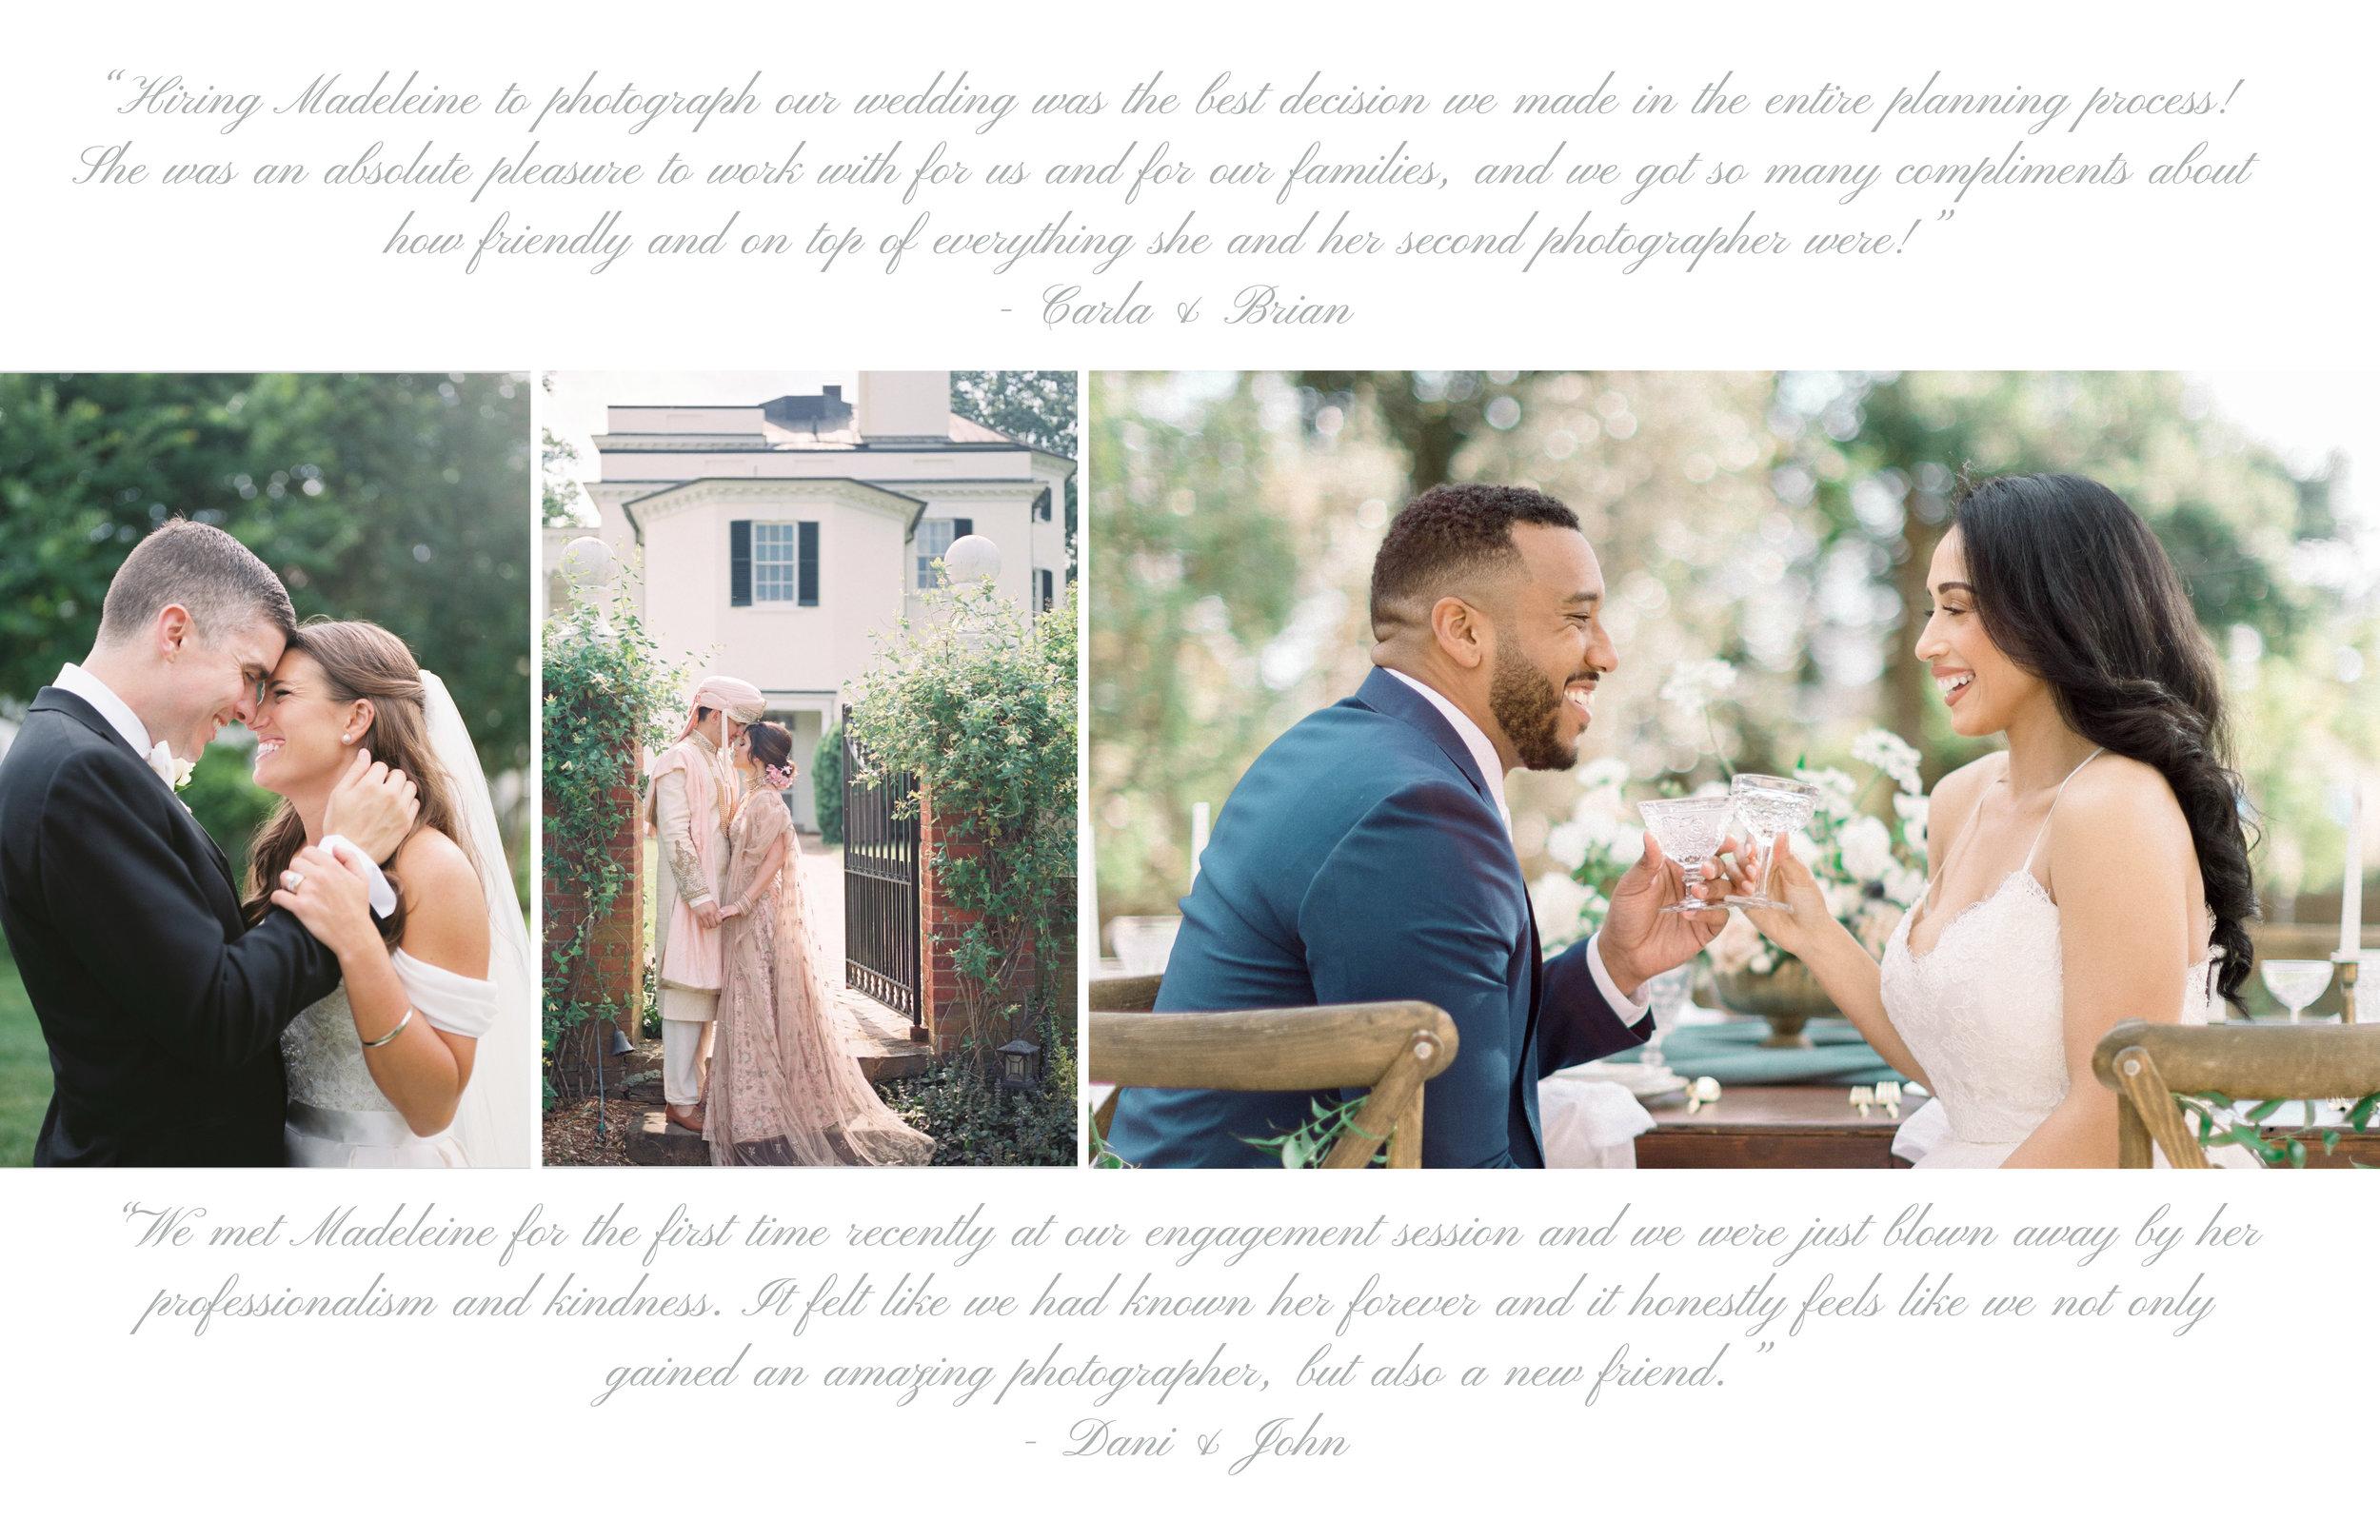 page 3.5.jpg